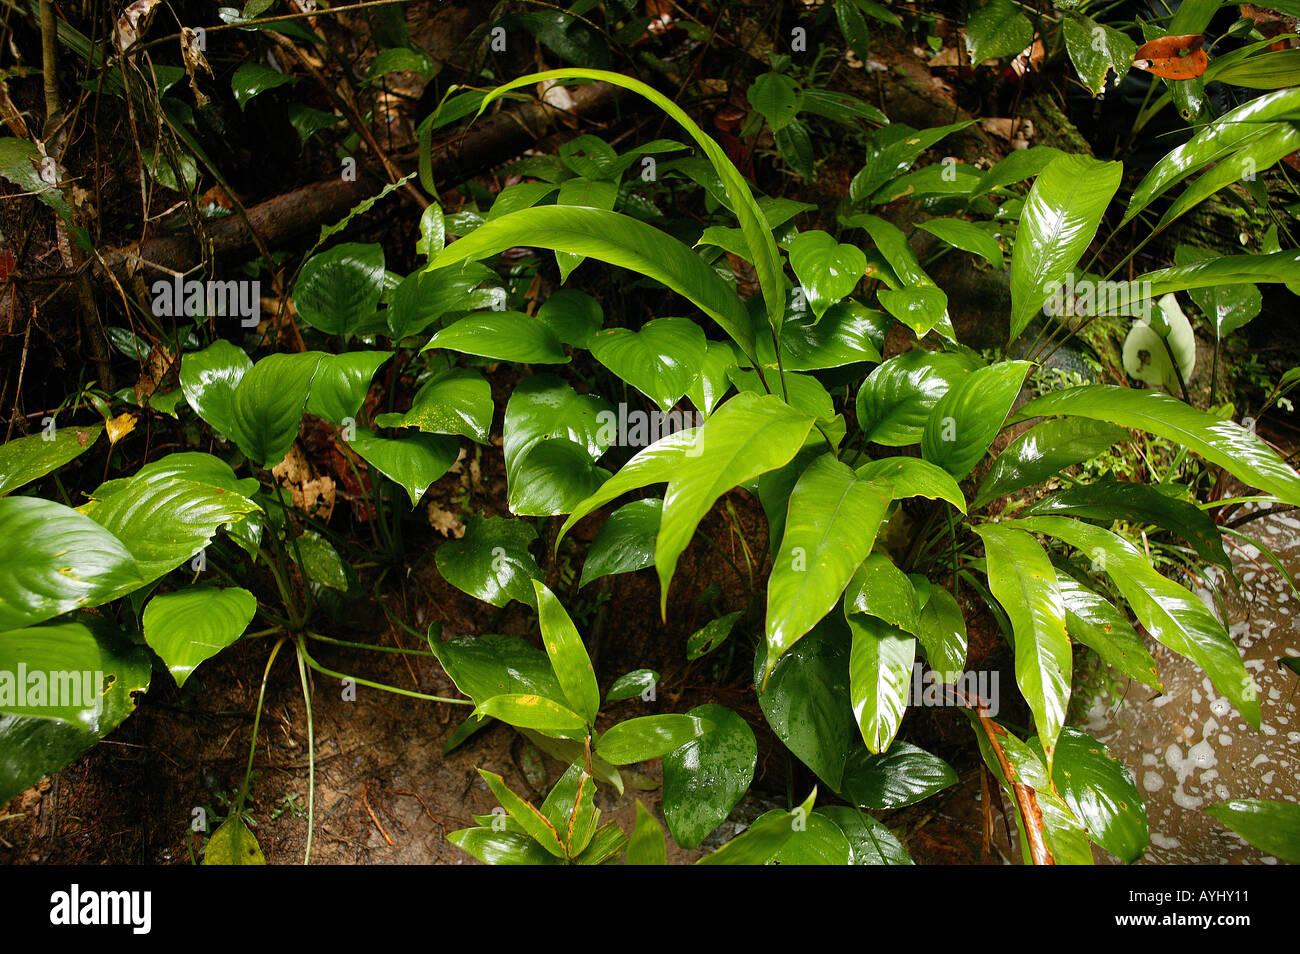 gruen blattpflanzen im urwald am rio negro region cueiras brasilien stockfoto lizenzfreies bild. Black Bedroom Furniture Sets. Home Design Ideas